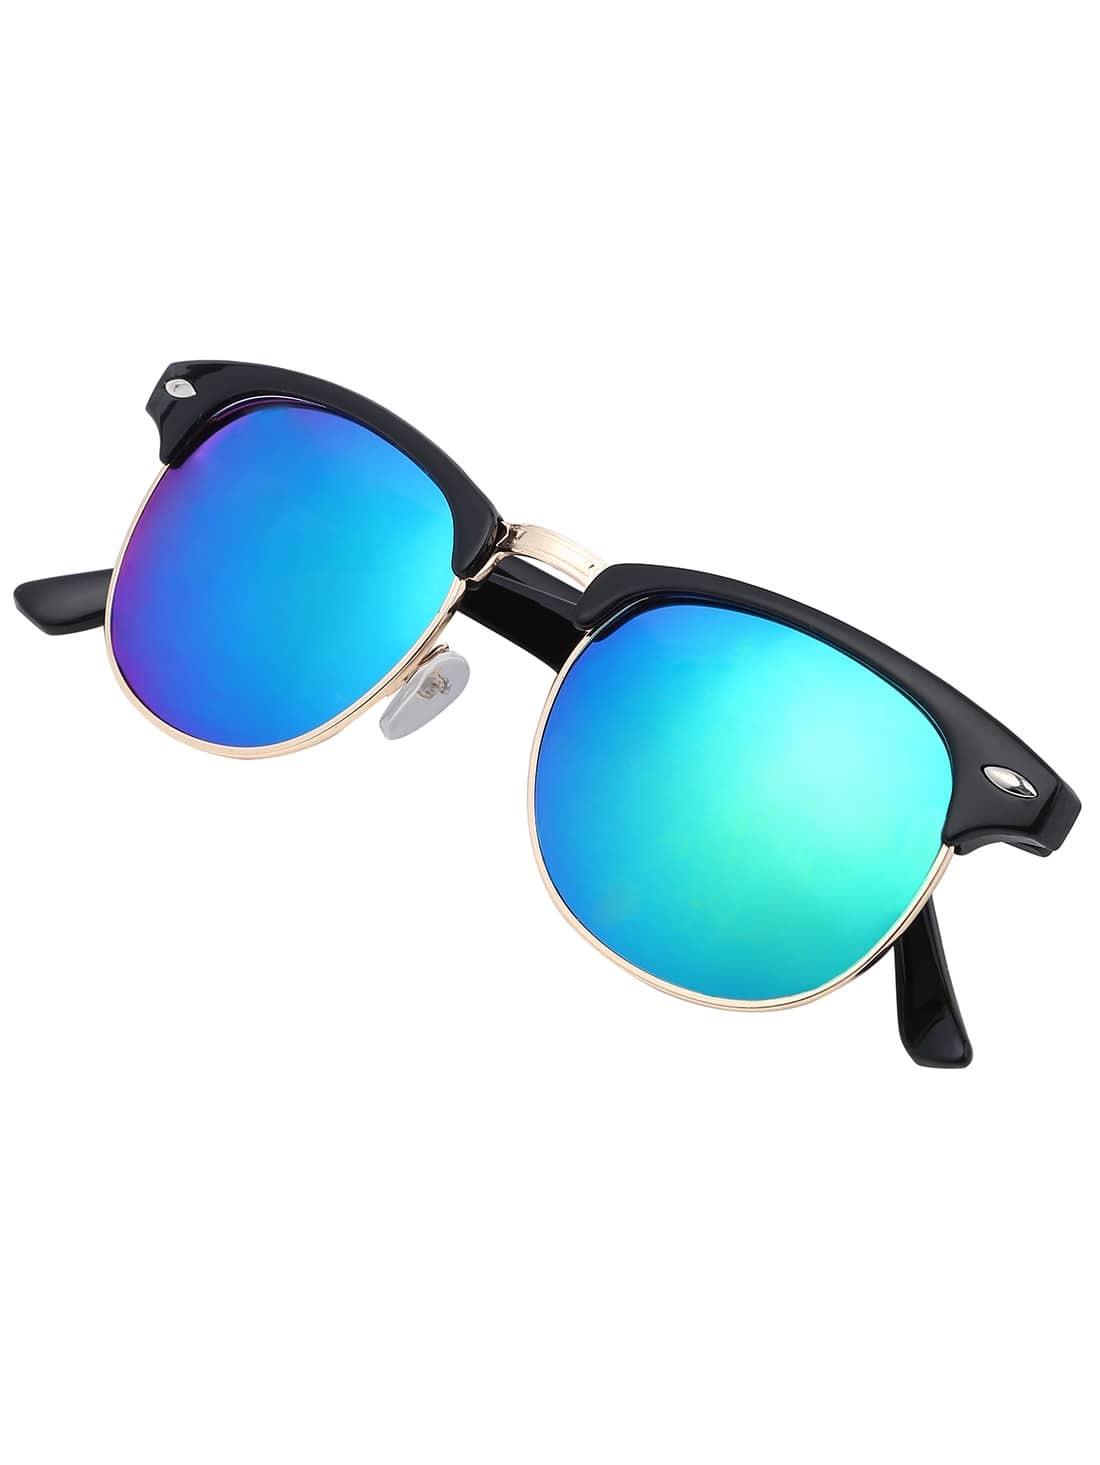 Browline Frame Mirrored Lenses Sunglasses